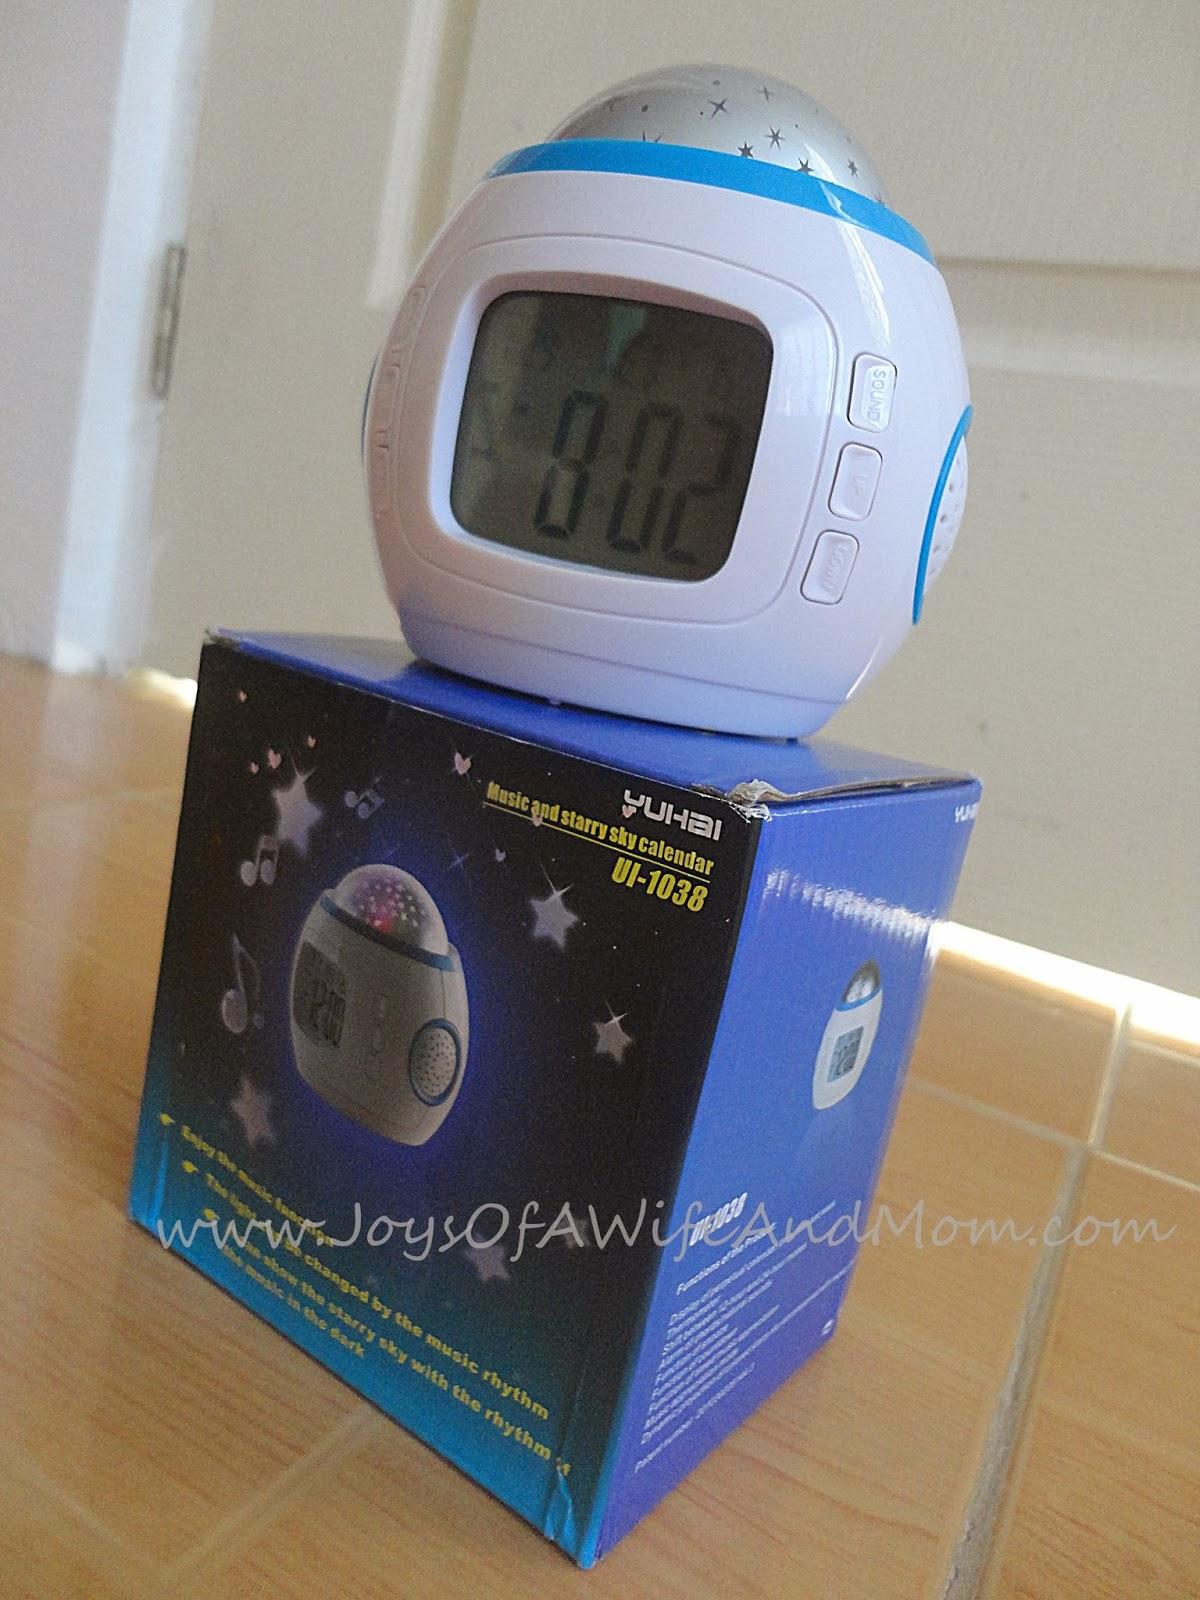 http://www.tmart.com/Stars-Music-3rd-Generation-Alarm-Clock-Projector_p117131.html